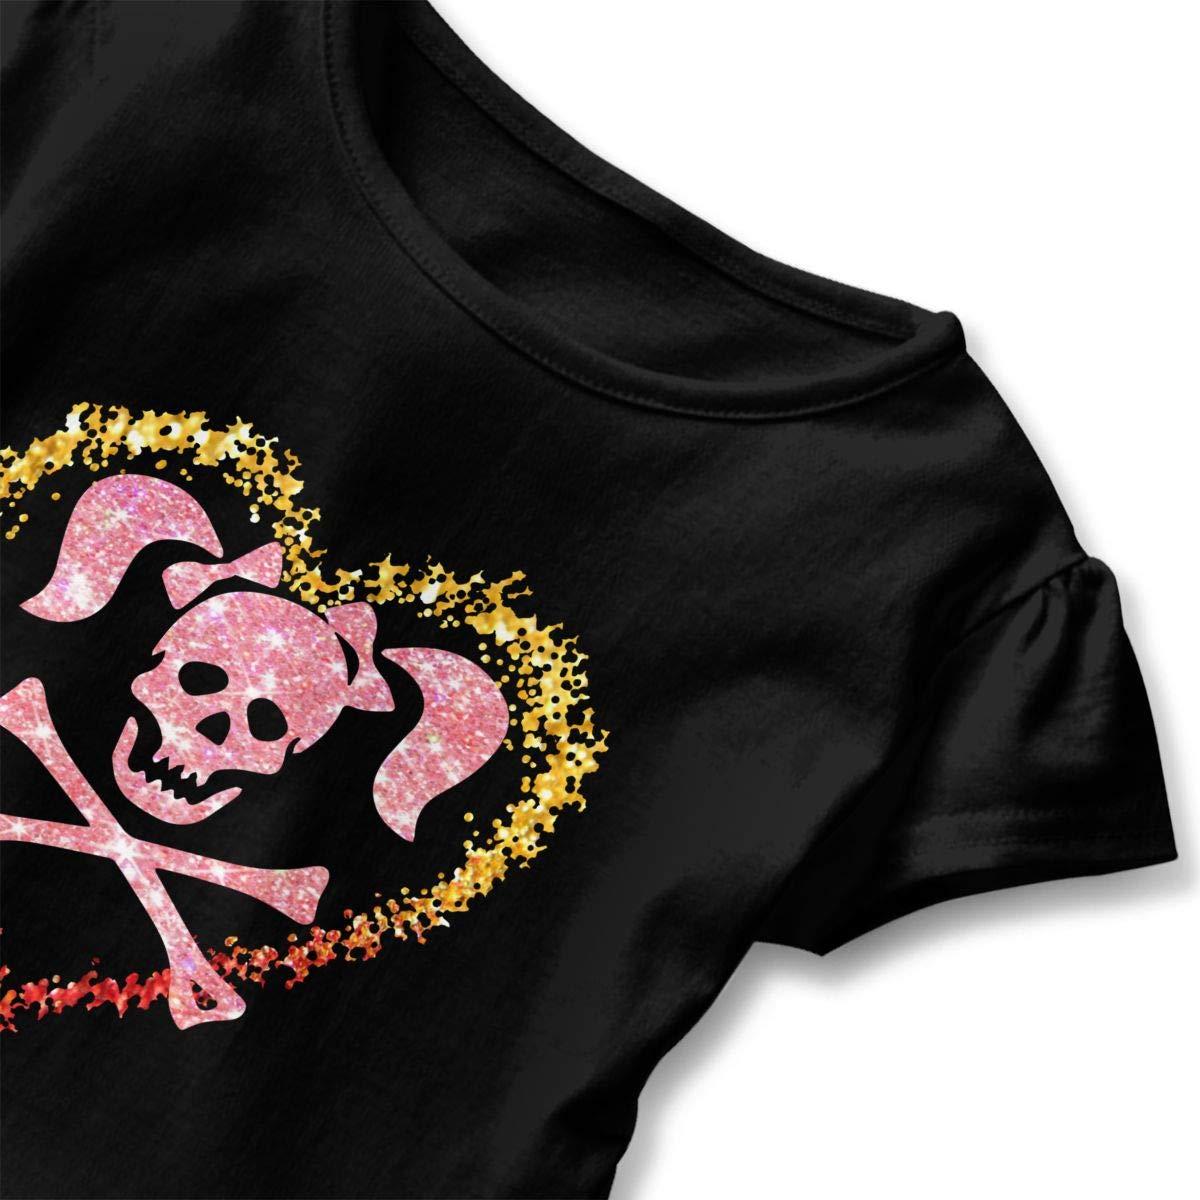 CZnuen Skull Crossbones Pigtails Heart Baby Girls Basic Short Puff Sleeve Round Neck Ruffle T-Shirt